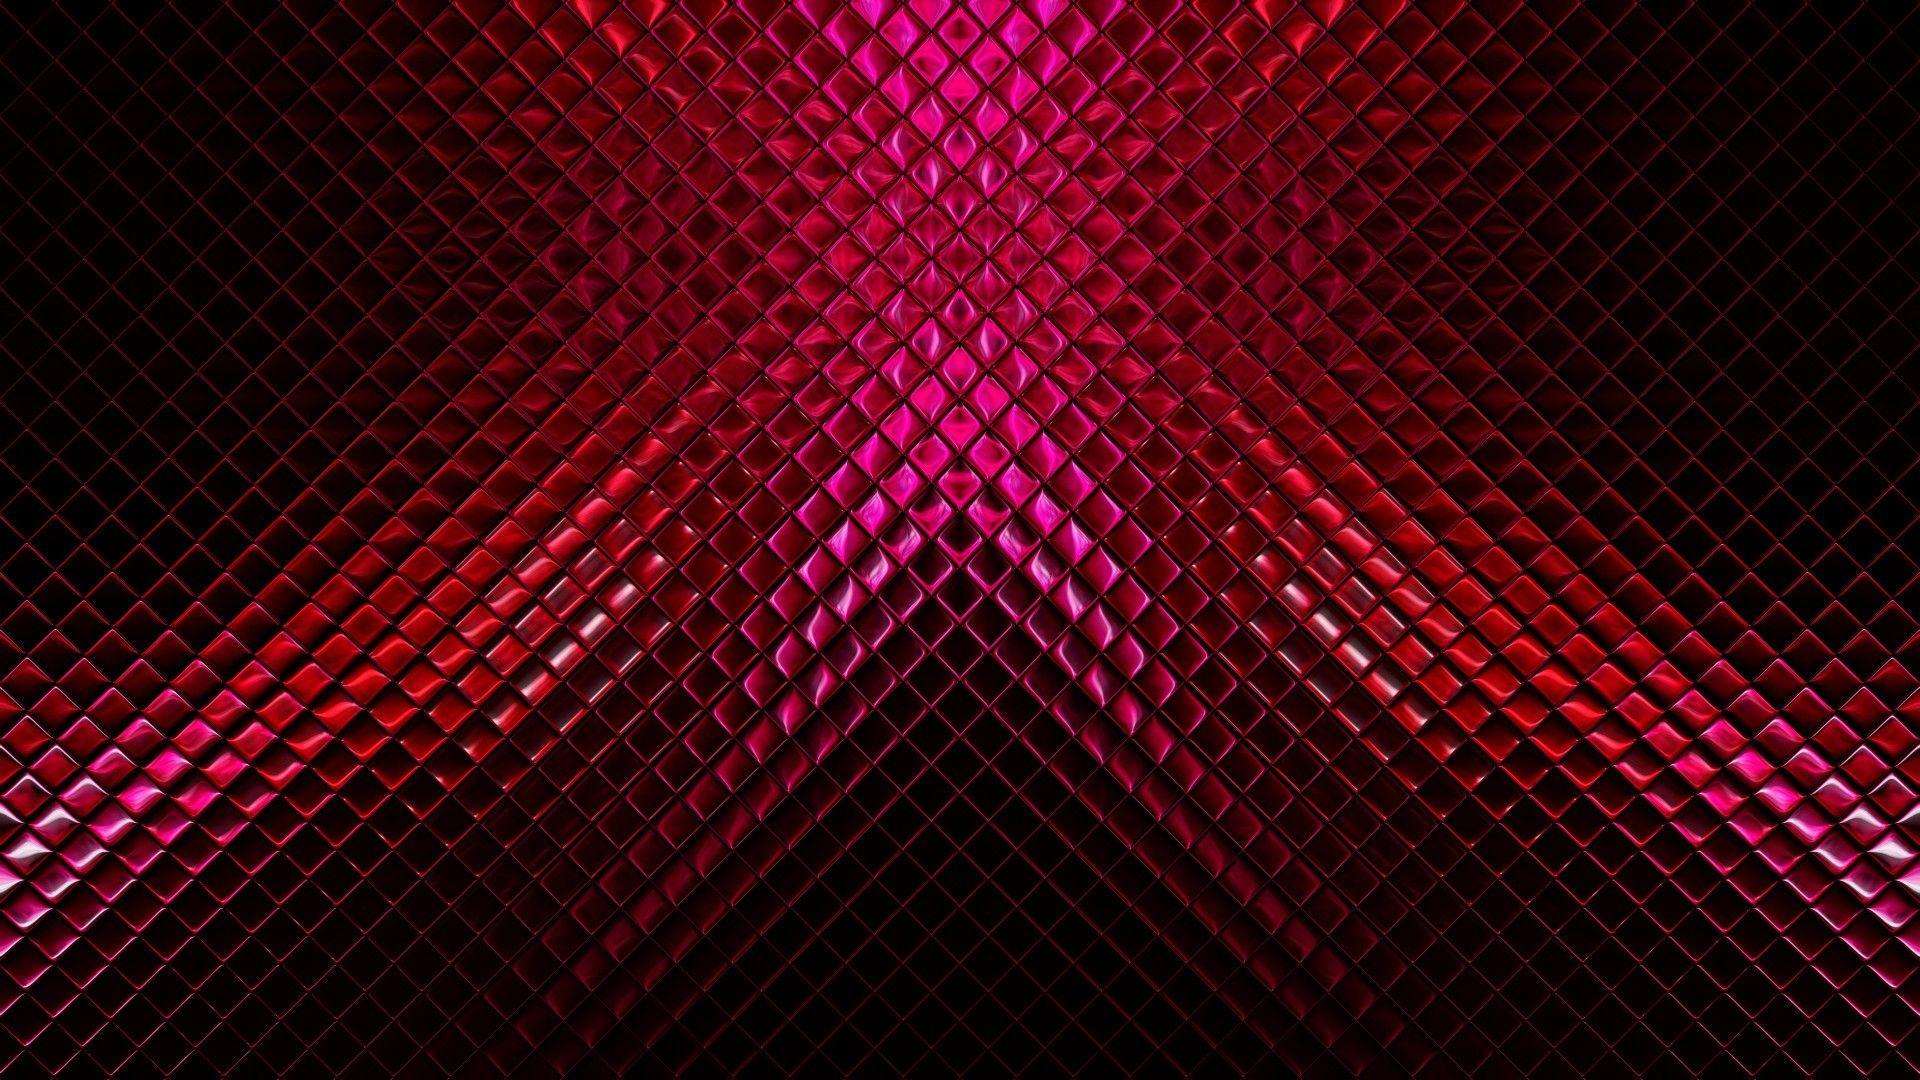 Elegant hd wallpaper download